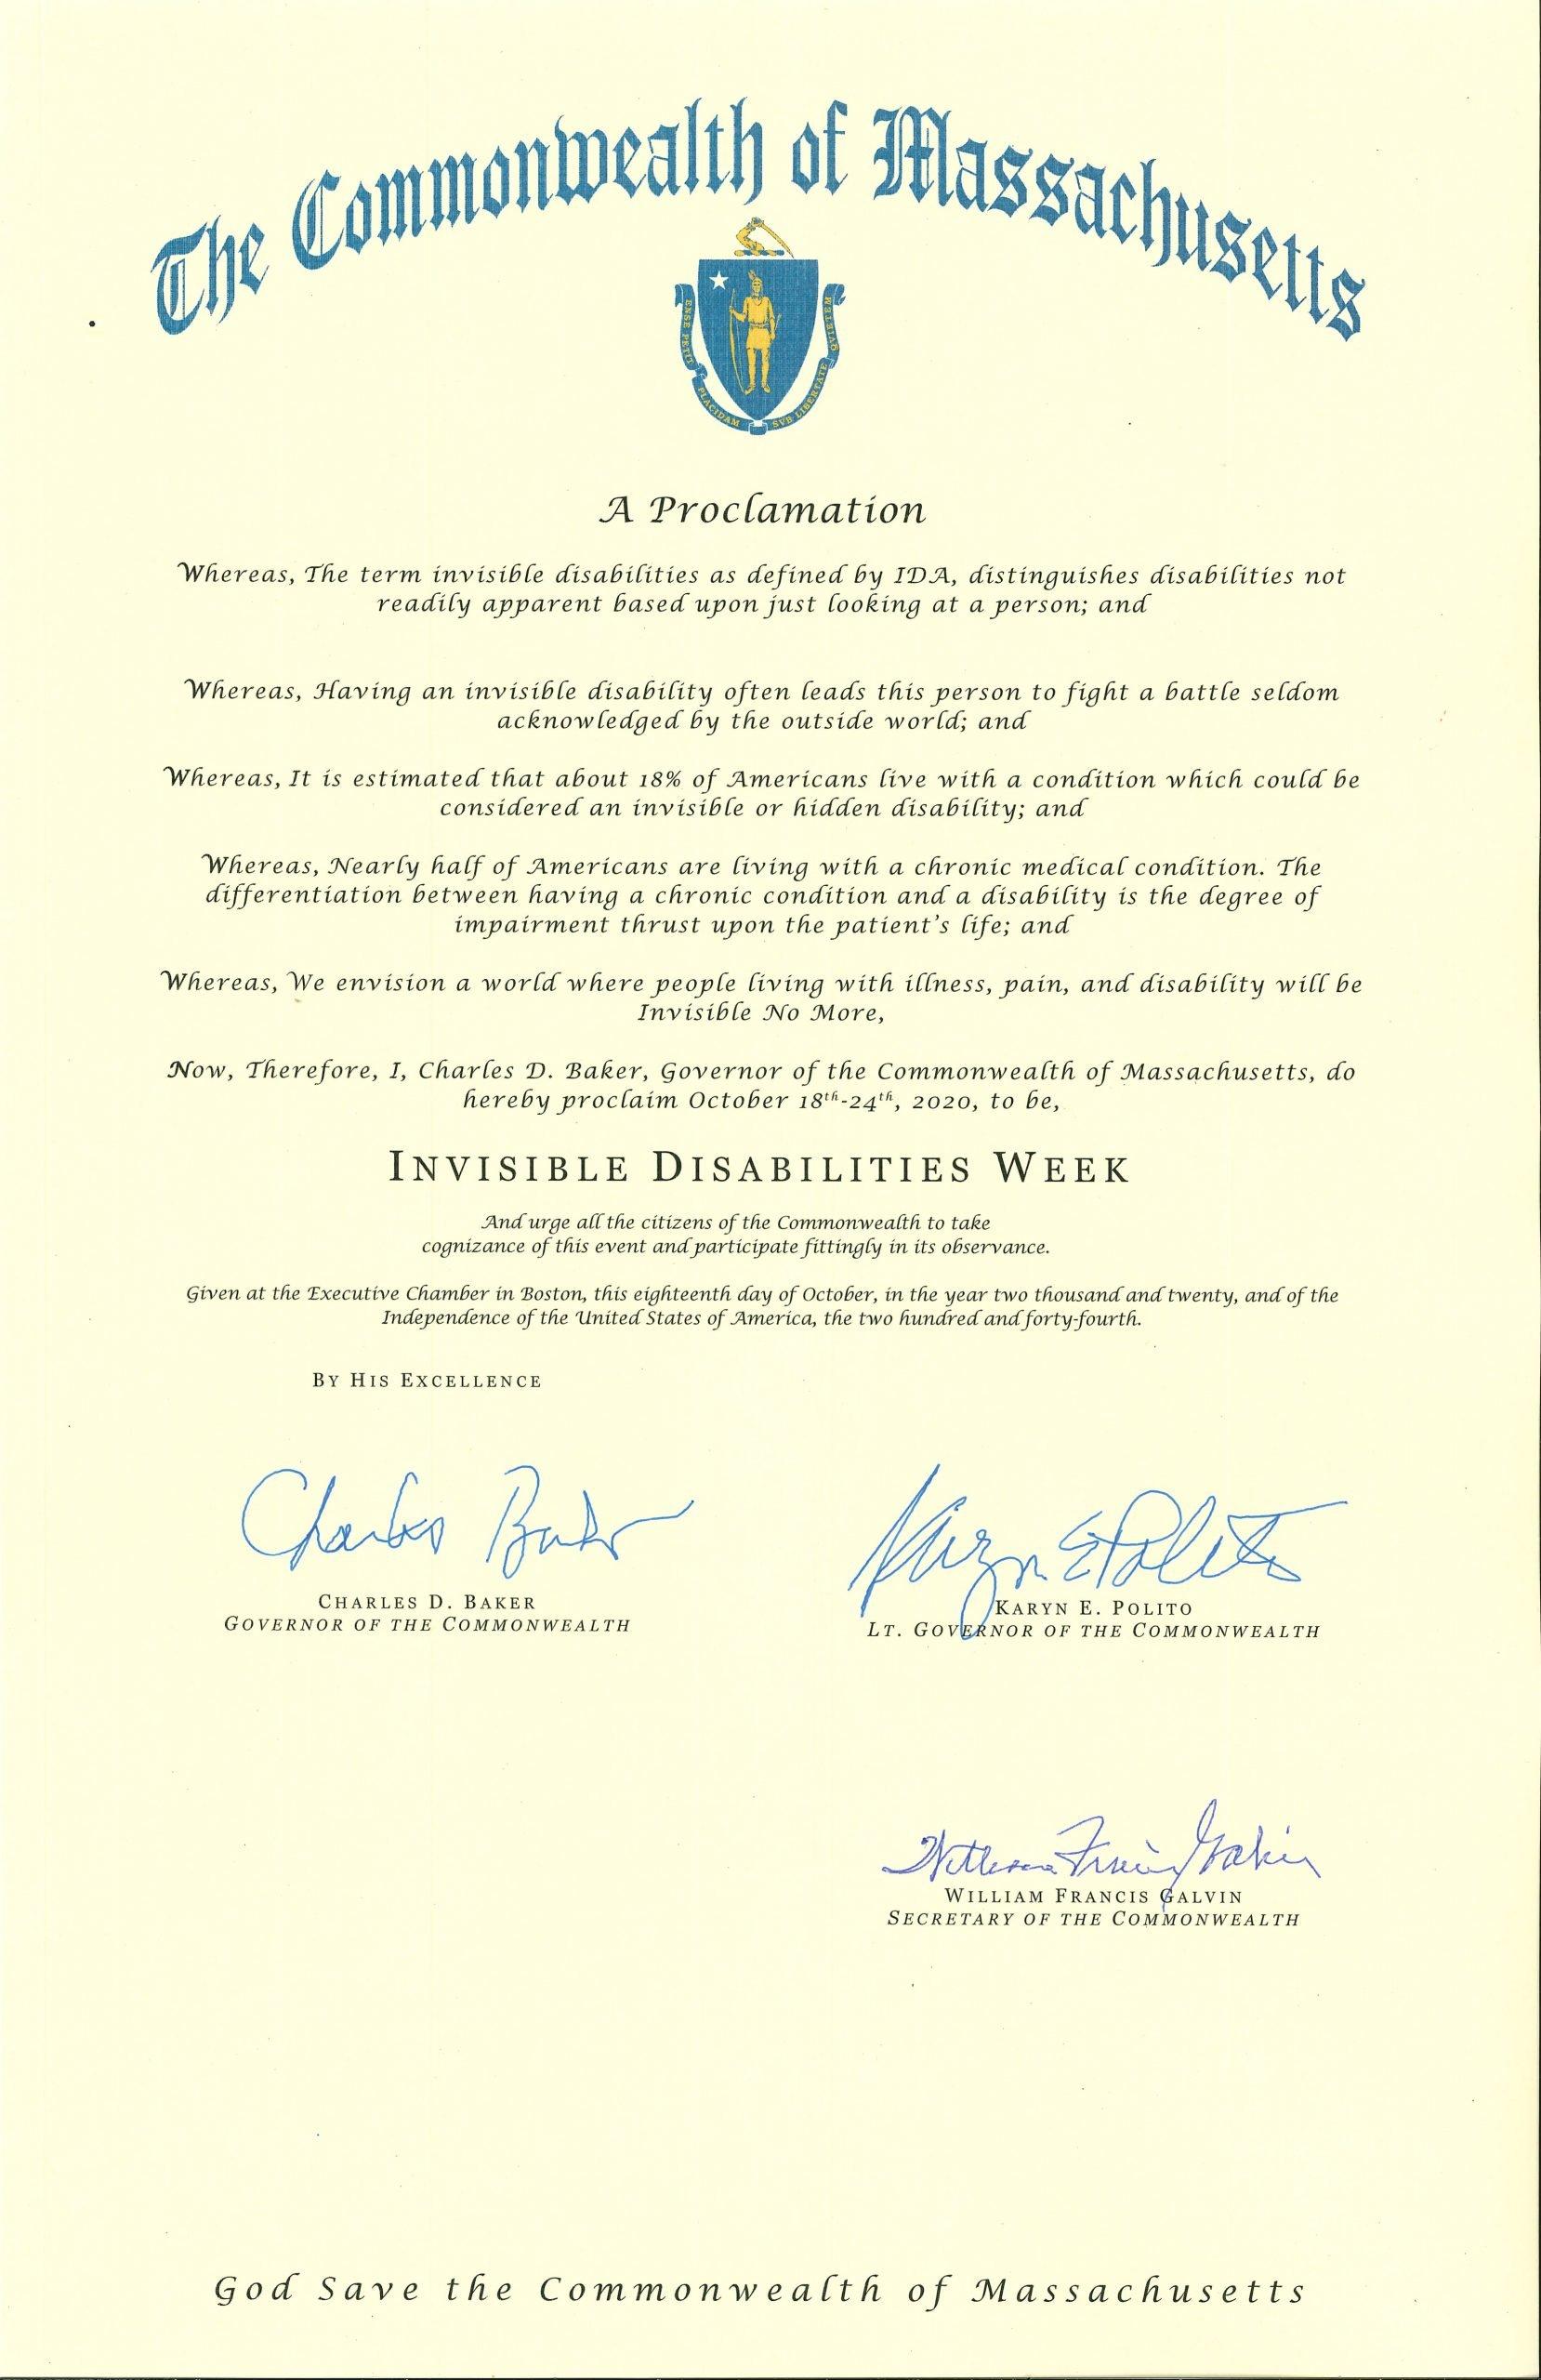 Massachusetts 2020 Invisible Disabilities Week Proclamation -Invisible Disabilities Association